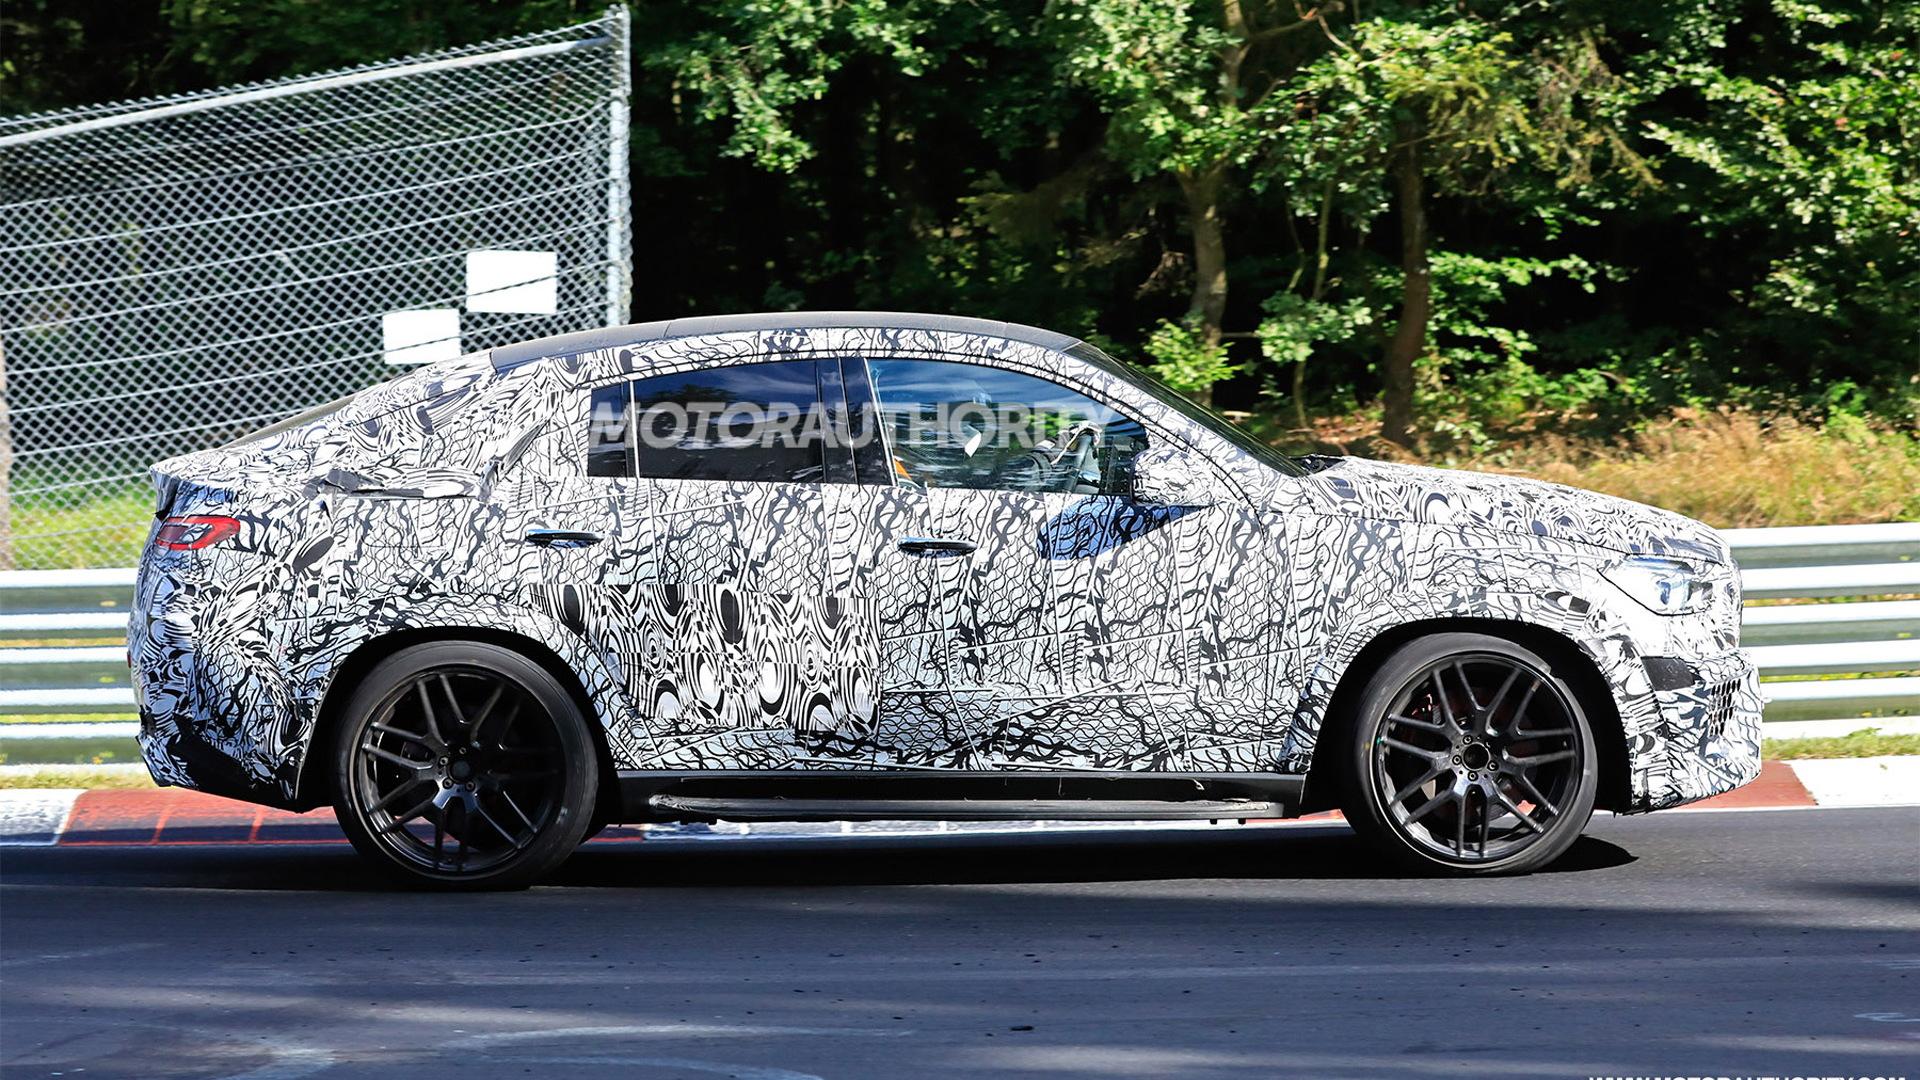 2021 Mercedes-AMG GLE63 Coupe spy shots - Photo credit: S. Baldauf/SB-Medien